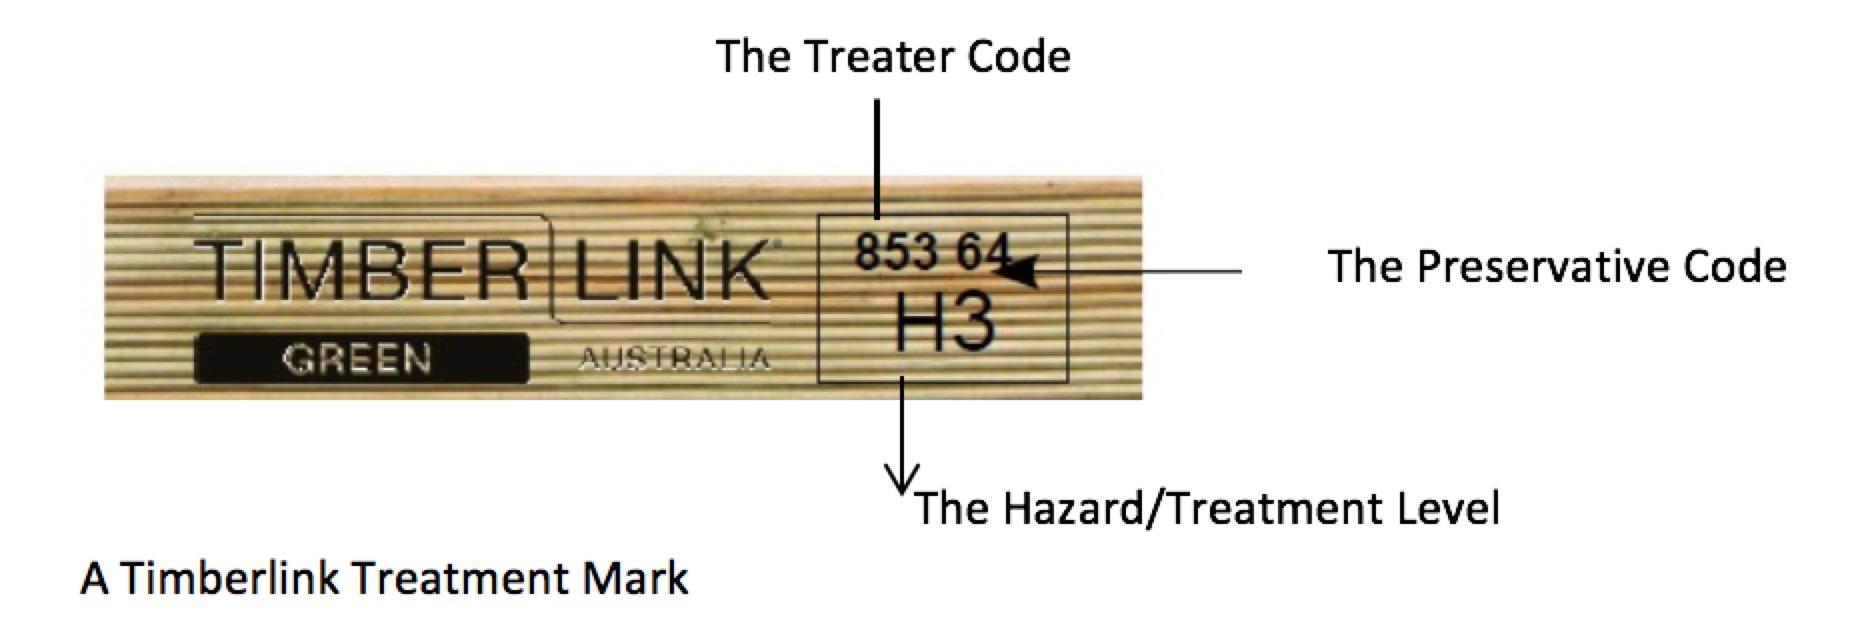 timberlink treatment mark